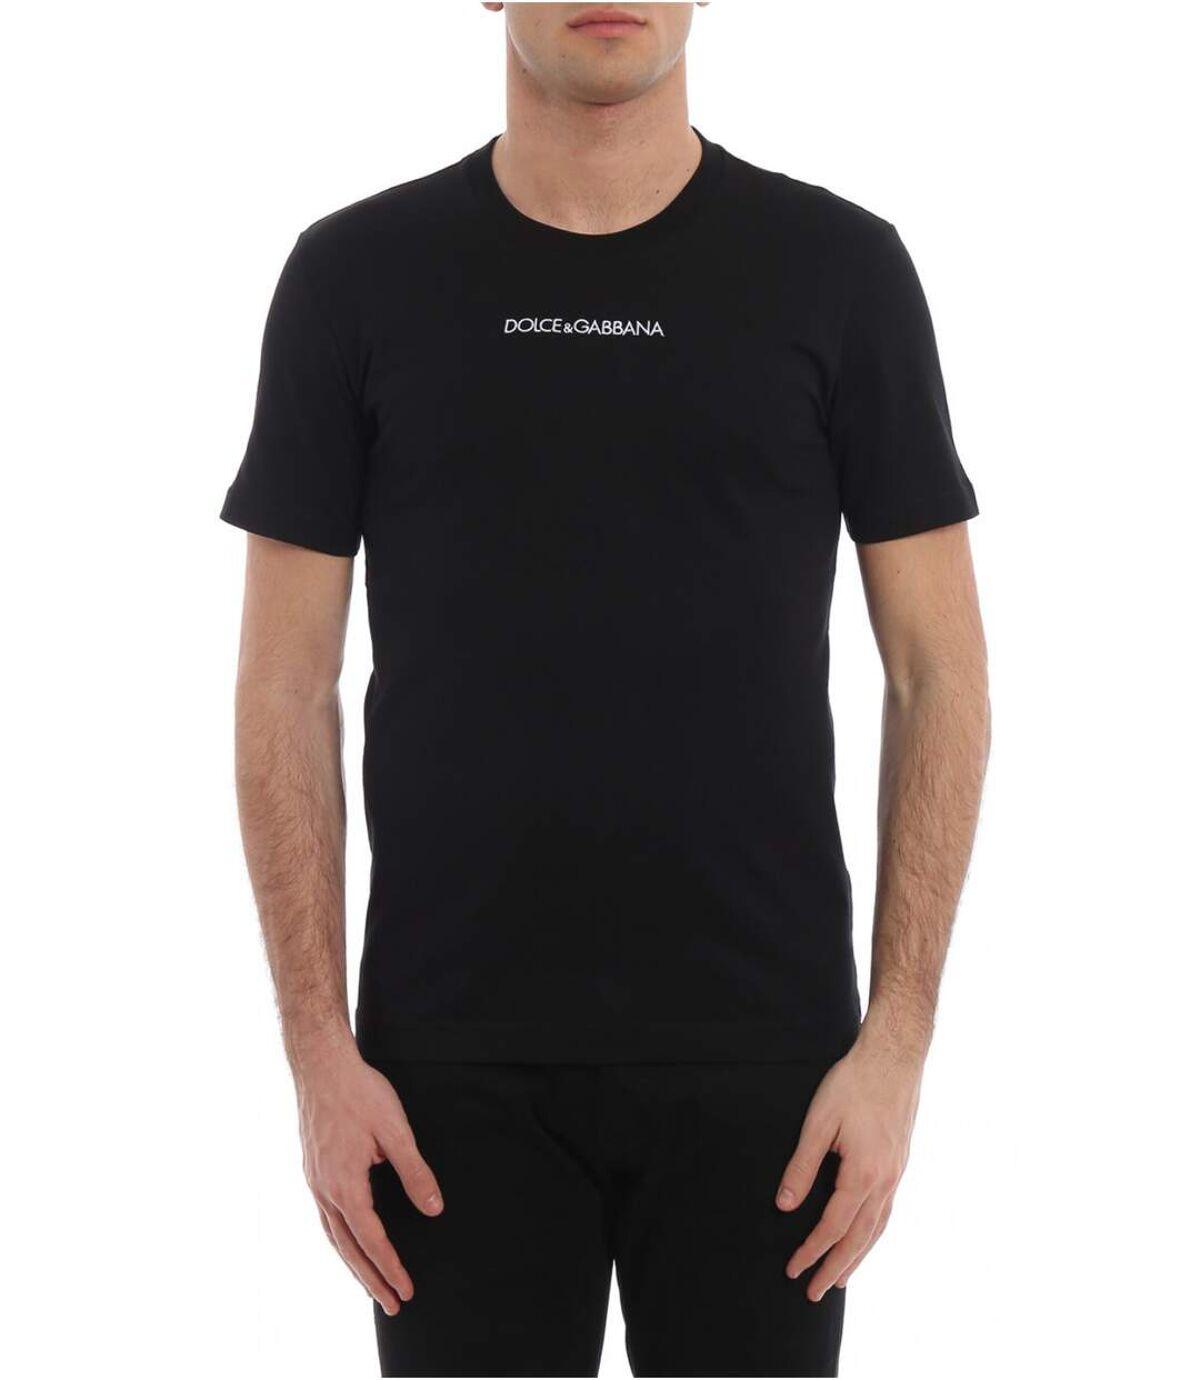 Tee shirt en coton iconic  -  Dolce&Gabbana - Homme